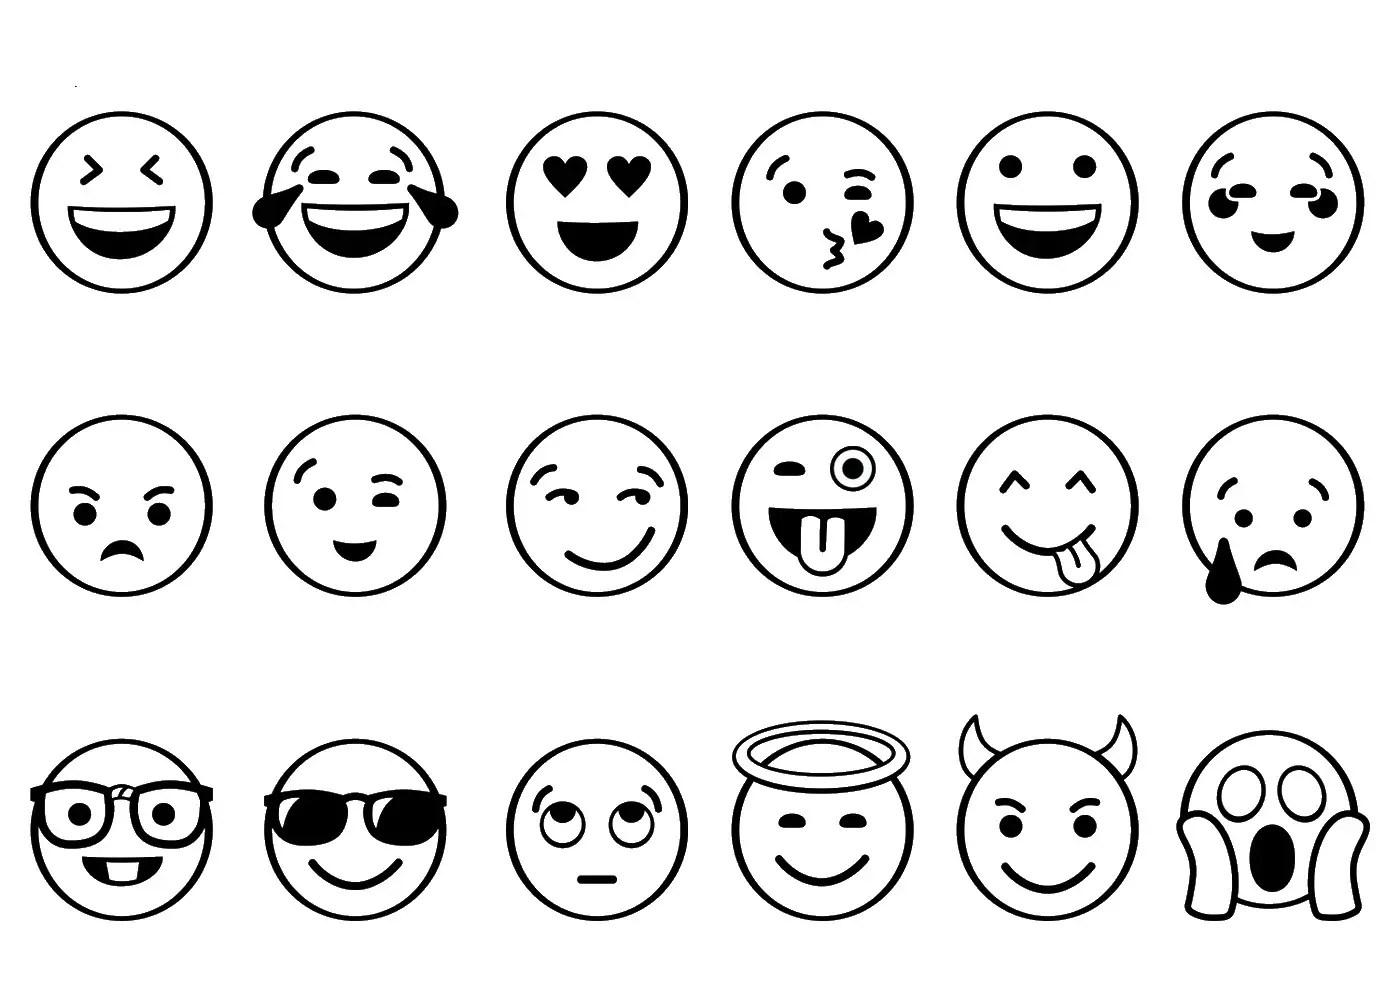 44 Awesome Printable Emojis